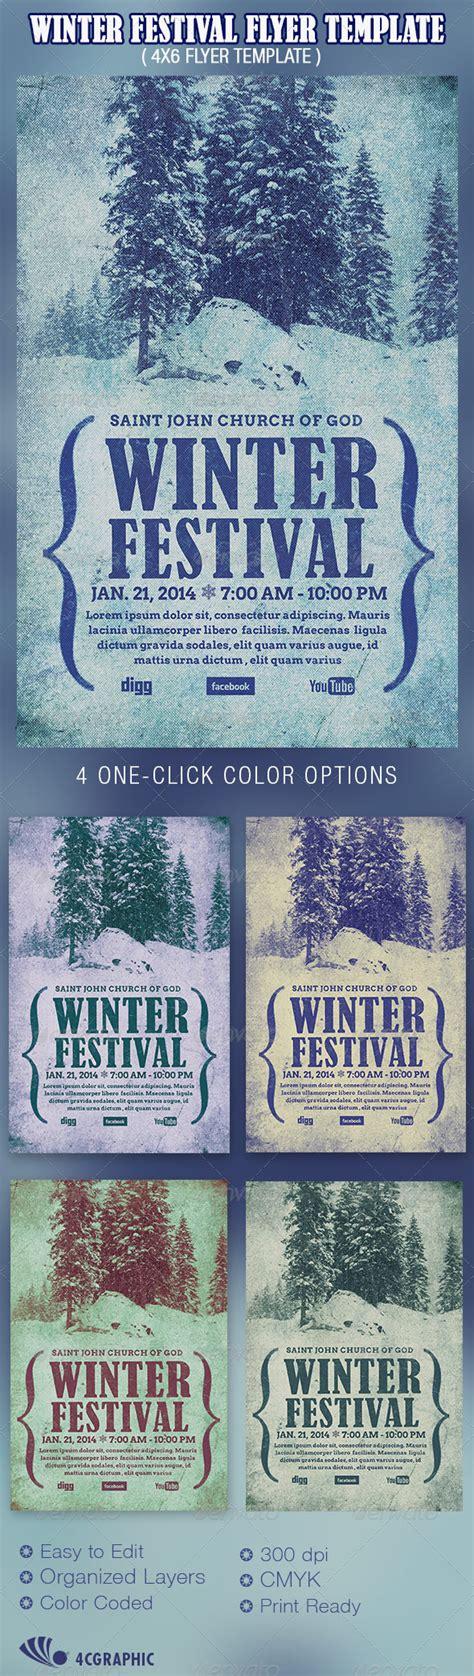 Winter Festival Flyer Template Graphicriver Graphicriver Event Flyer Template